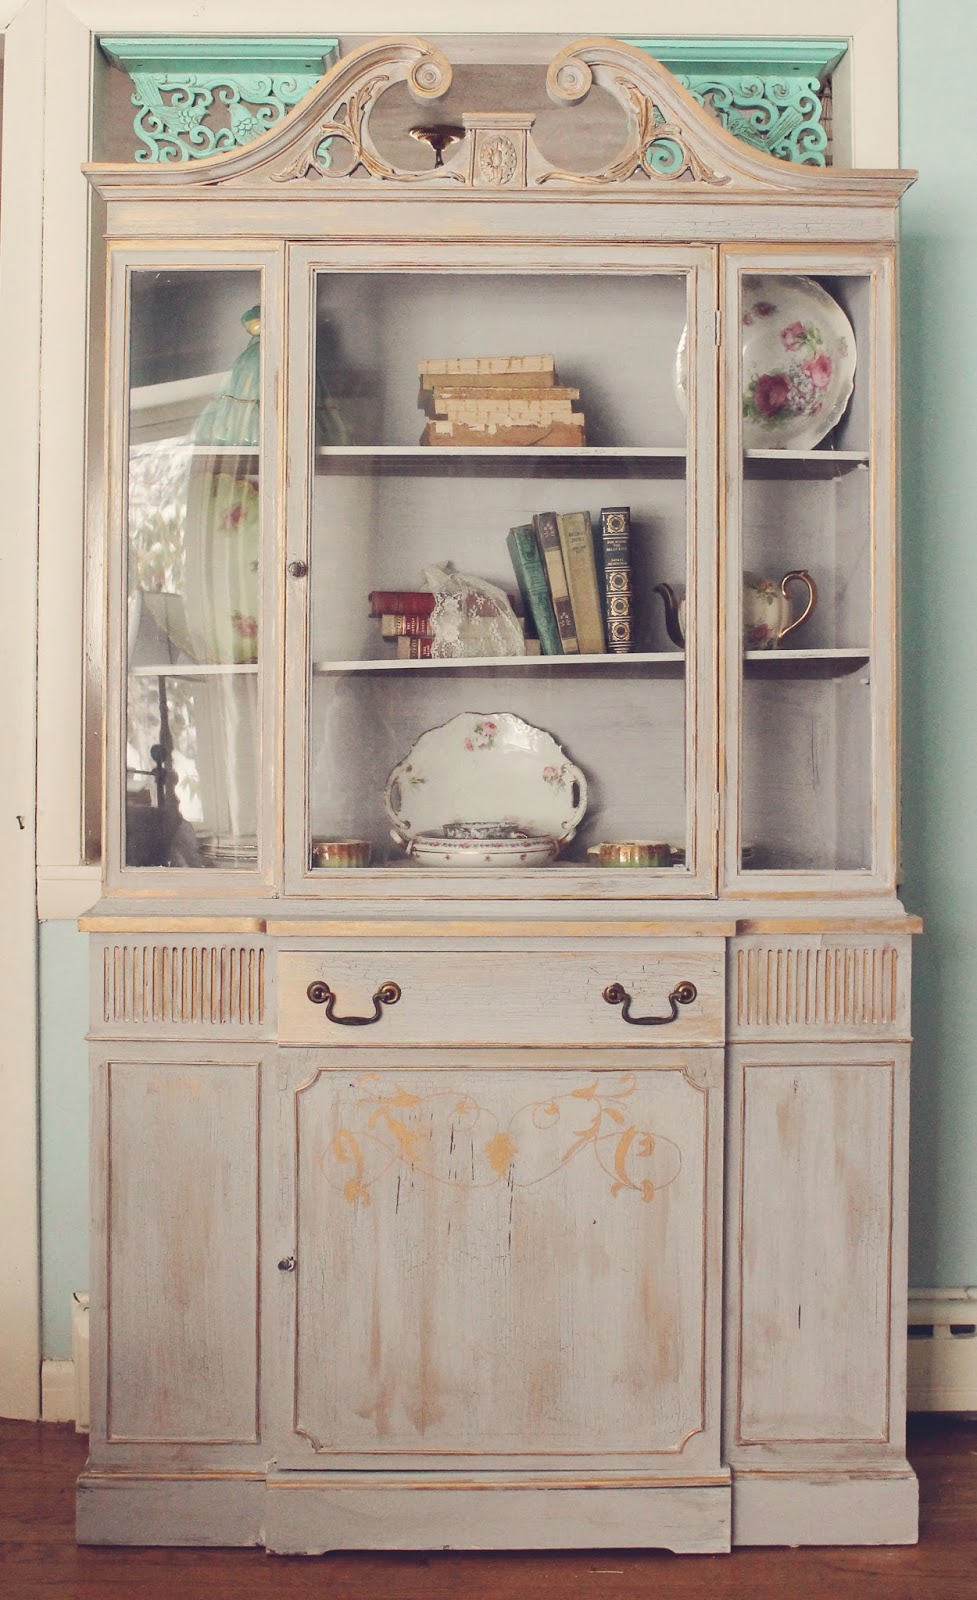 trois petites filles gilded armoire. Black Bedroom Furniture Sets. Home Design Ideas